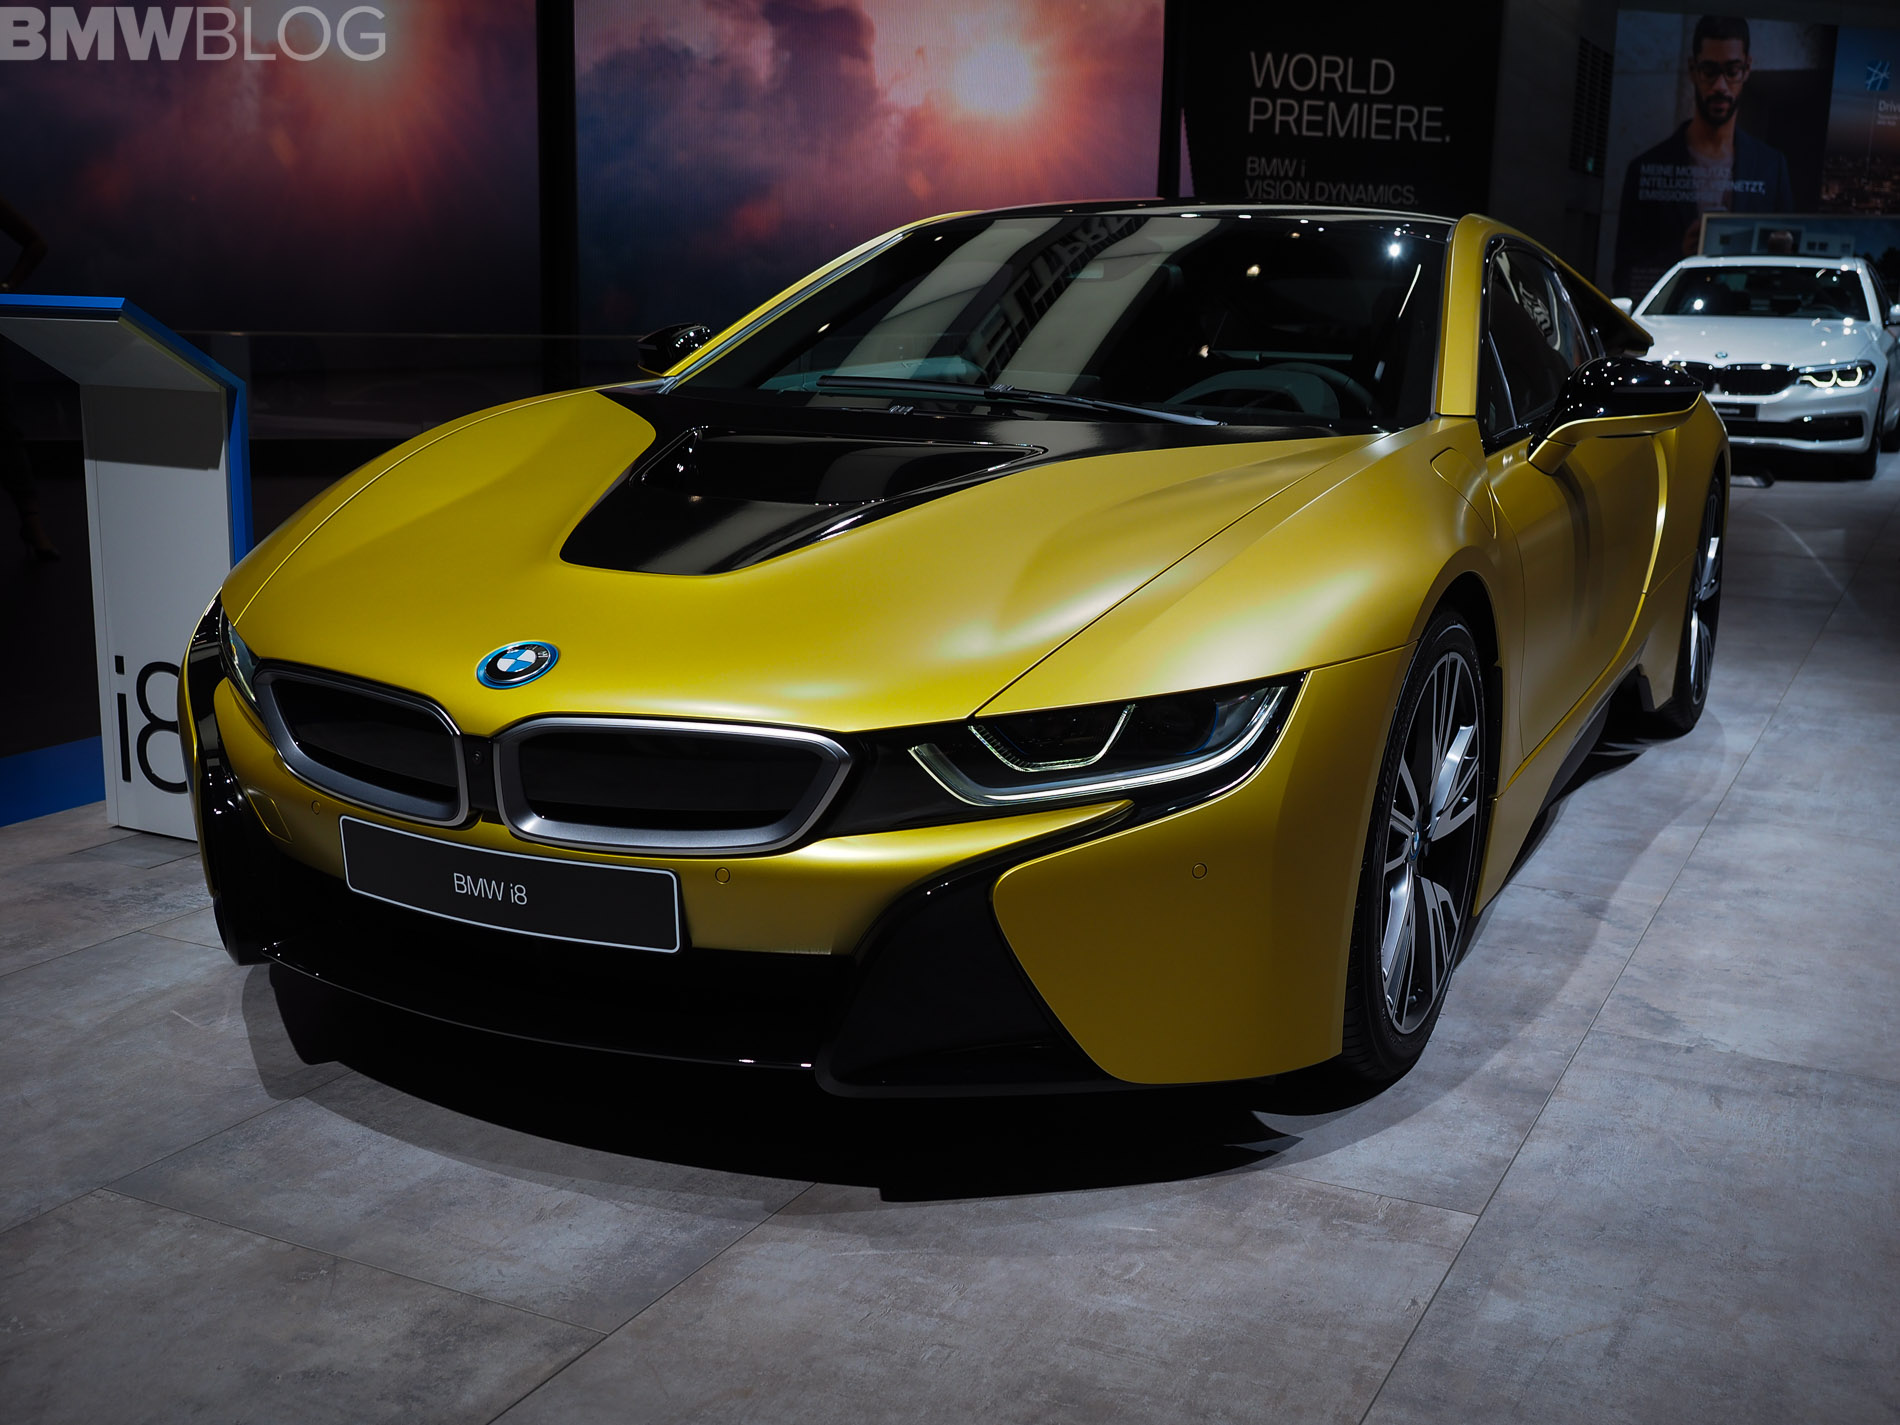 The Stunning Bmw I8 Protonic Frozen Yellow Edition Shines In Frankfurt